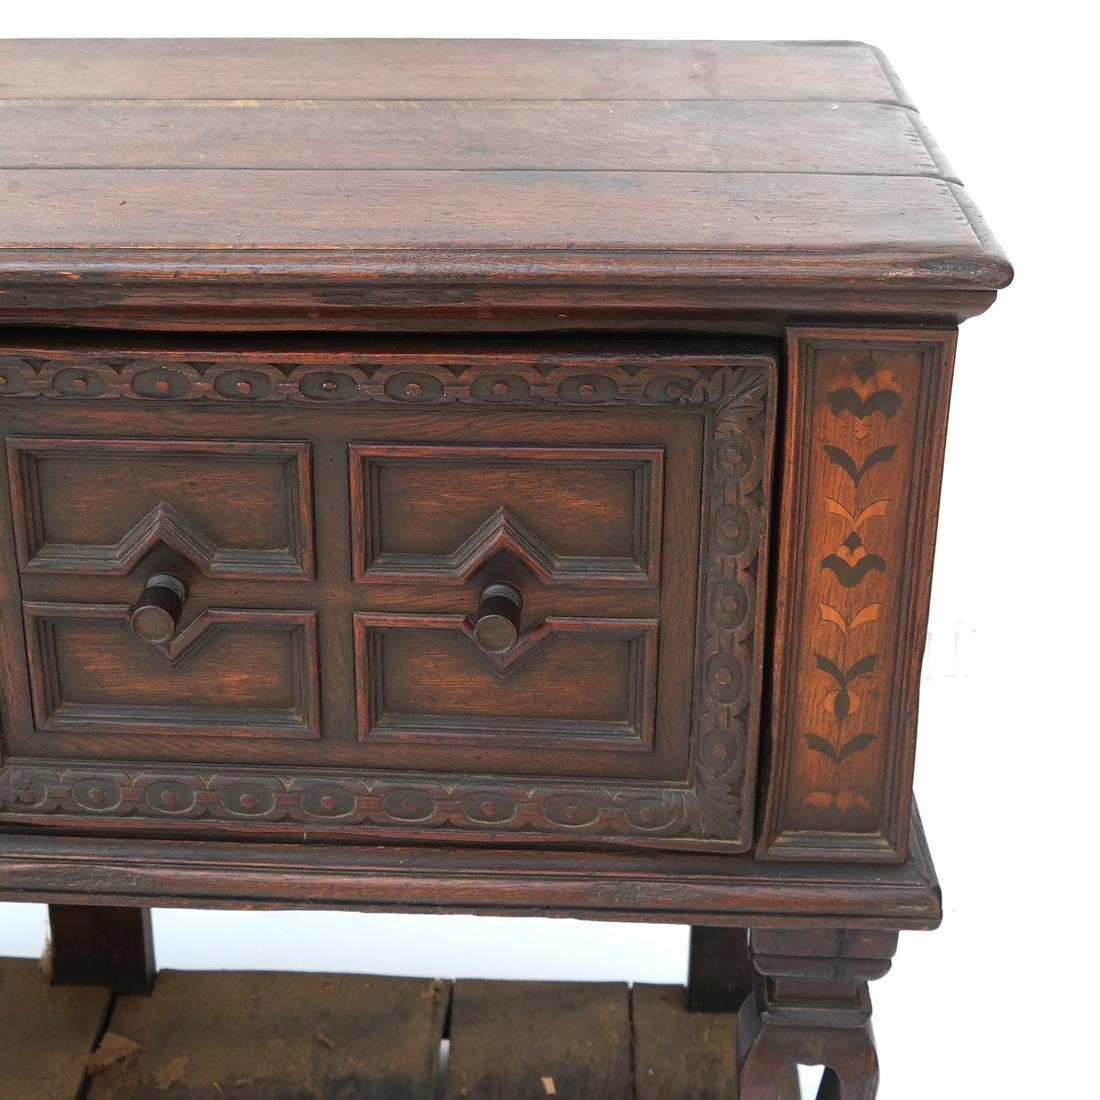 Jacobean-Style Inlaid Oak Sideboard - 5